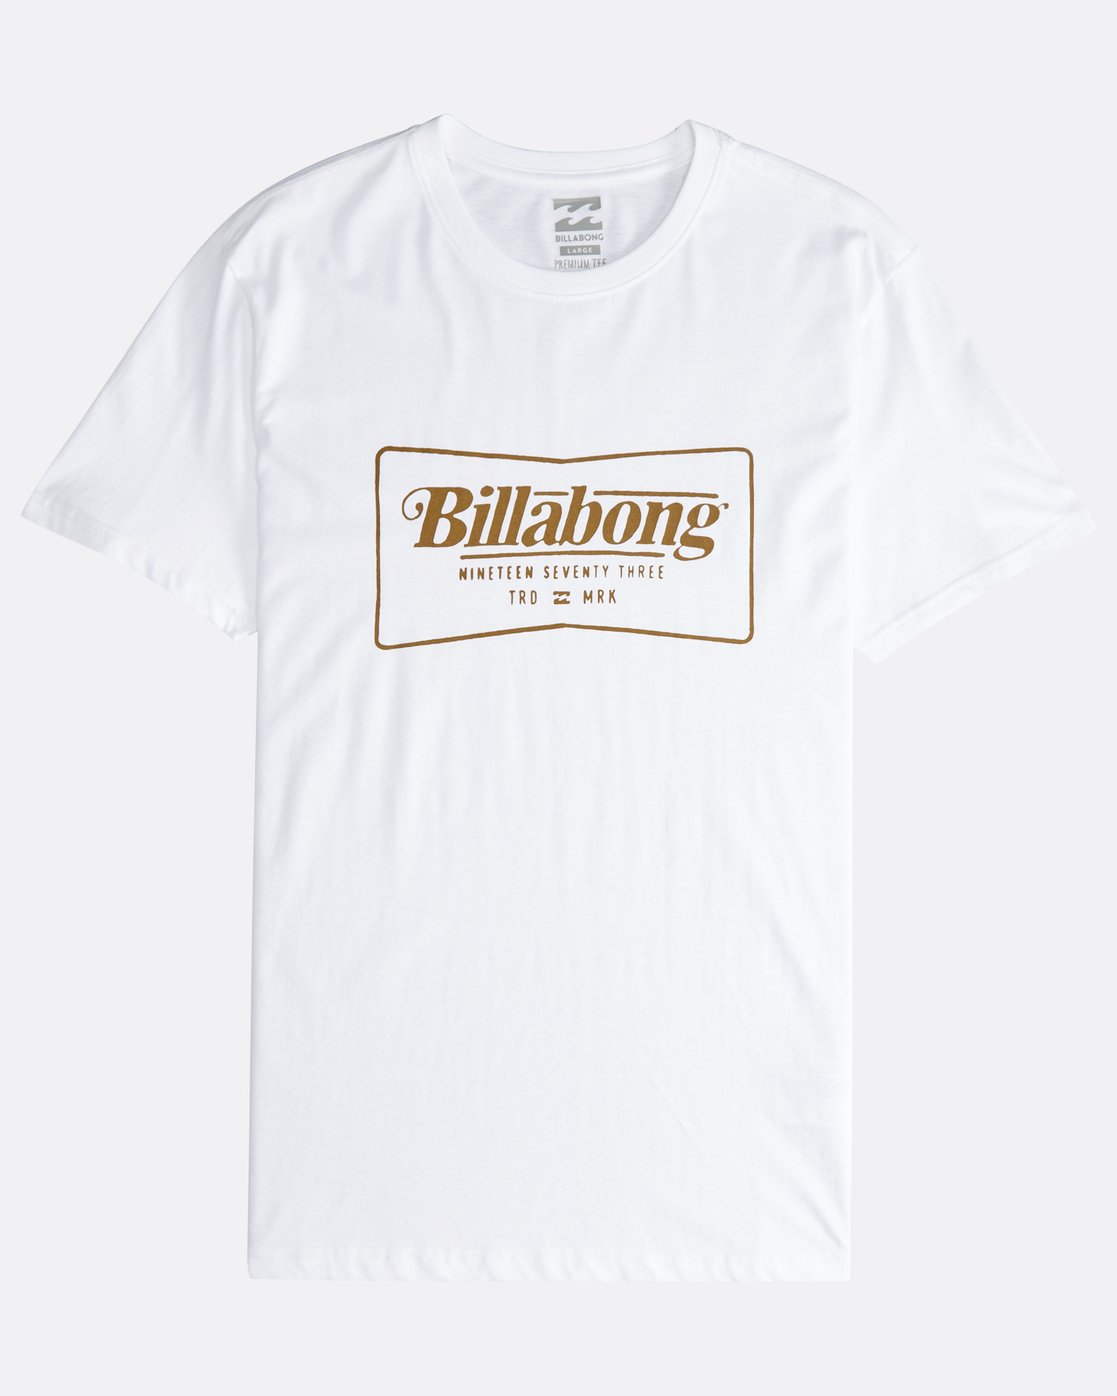 Billabong Trademark Mens T-shirt Black All Sizes